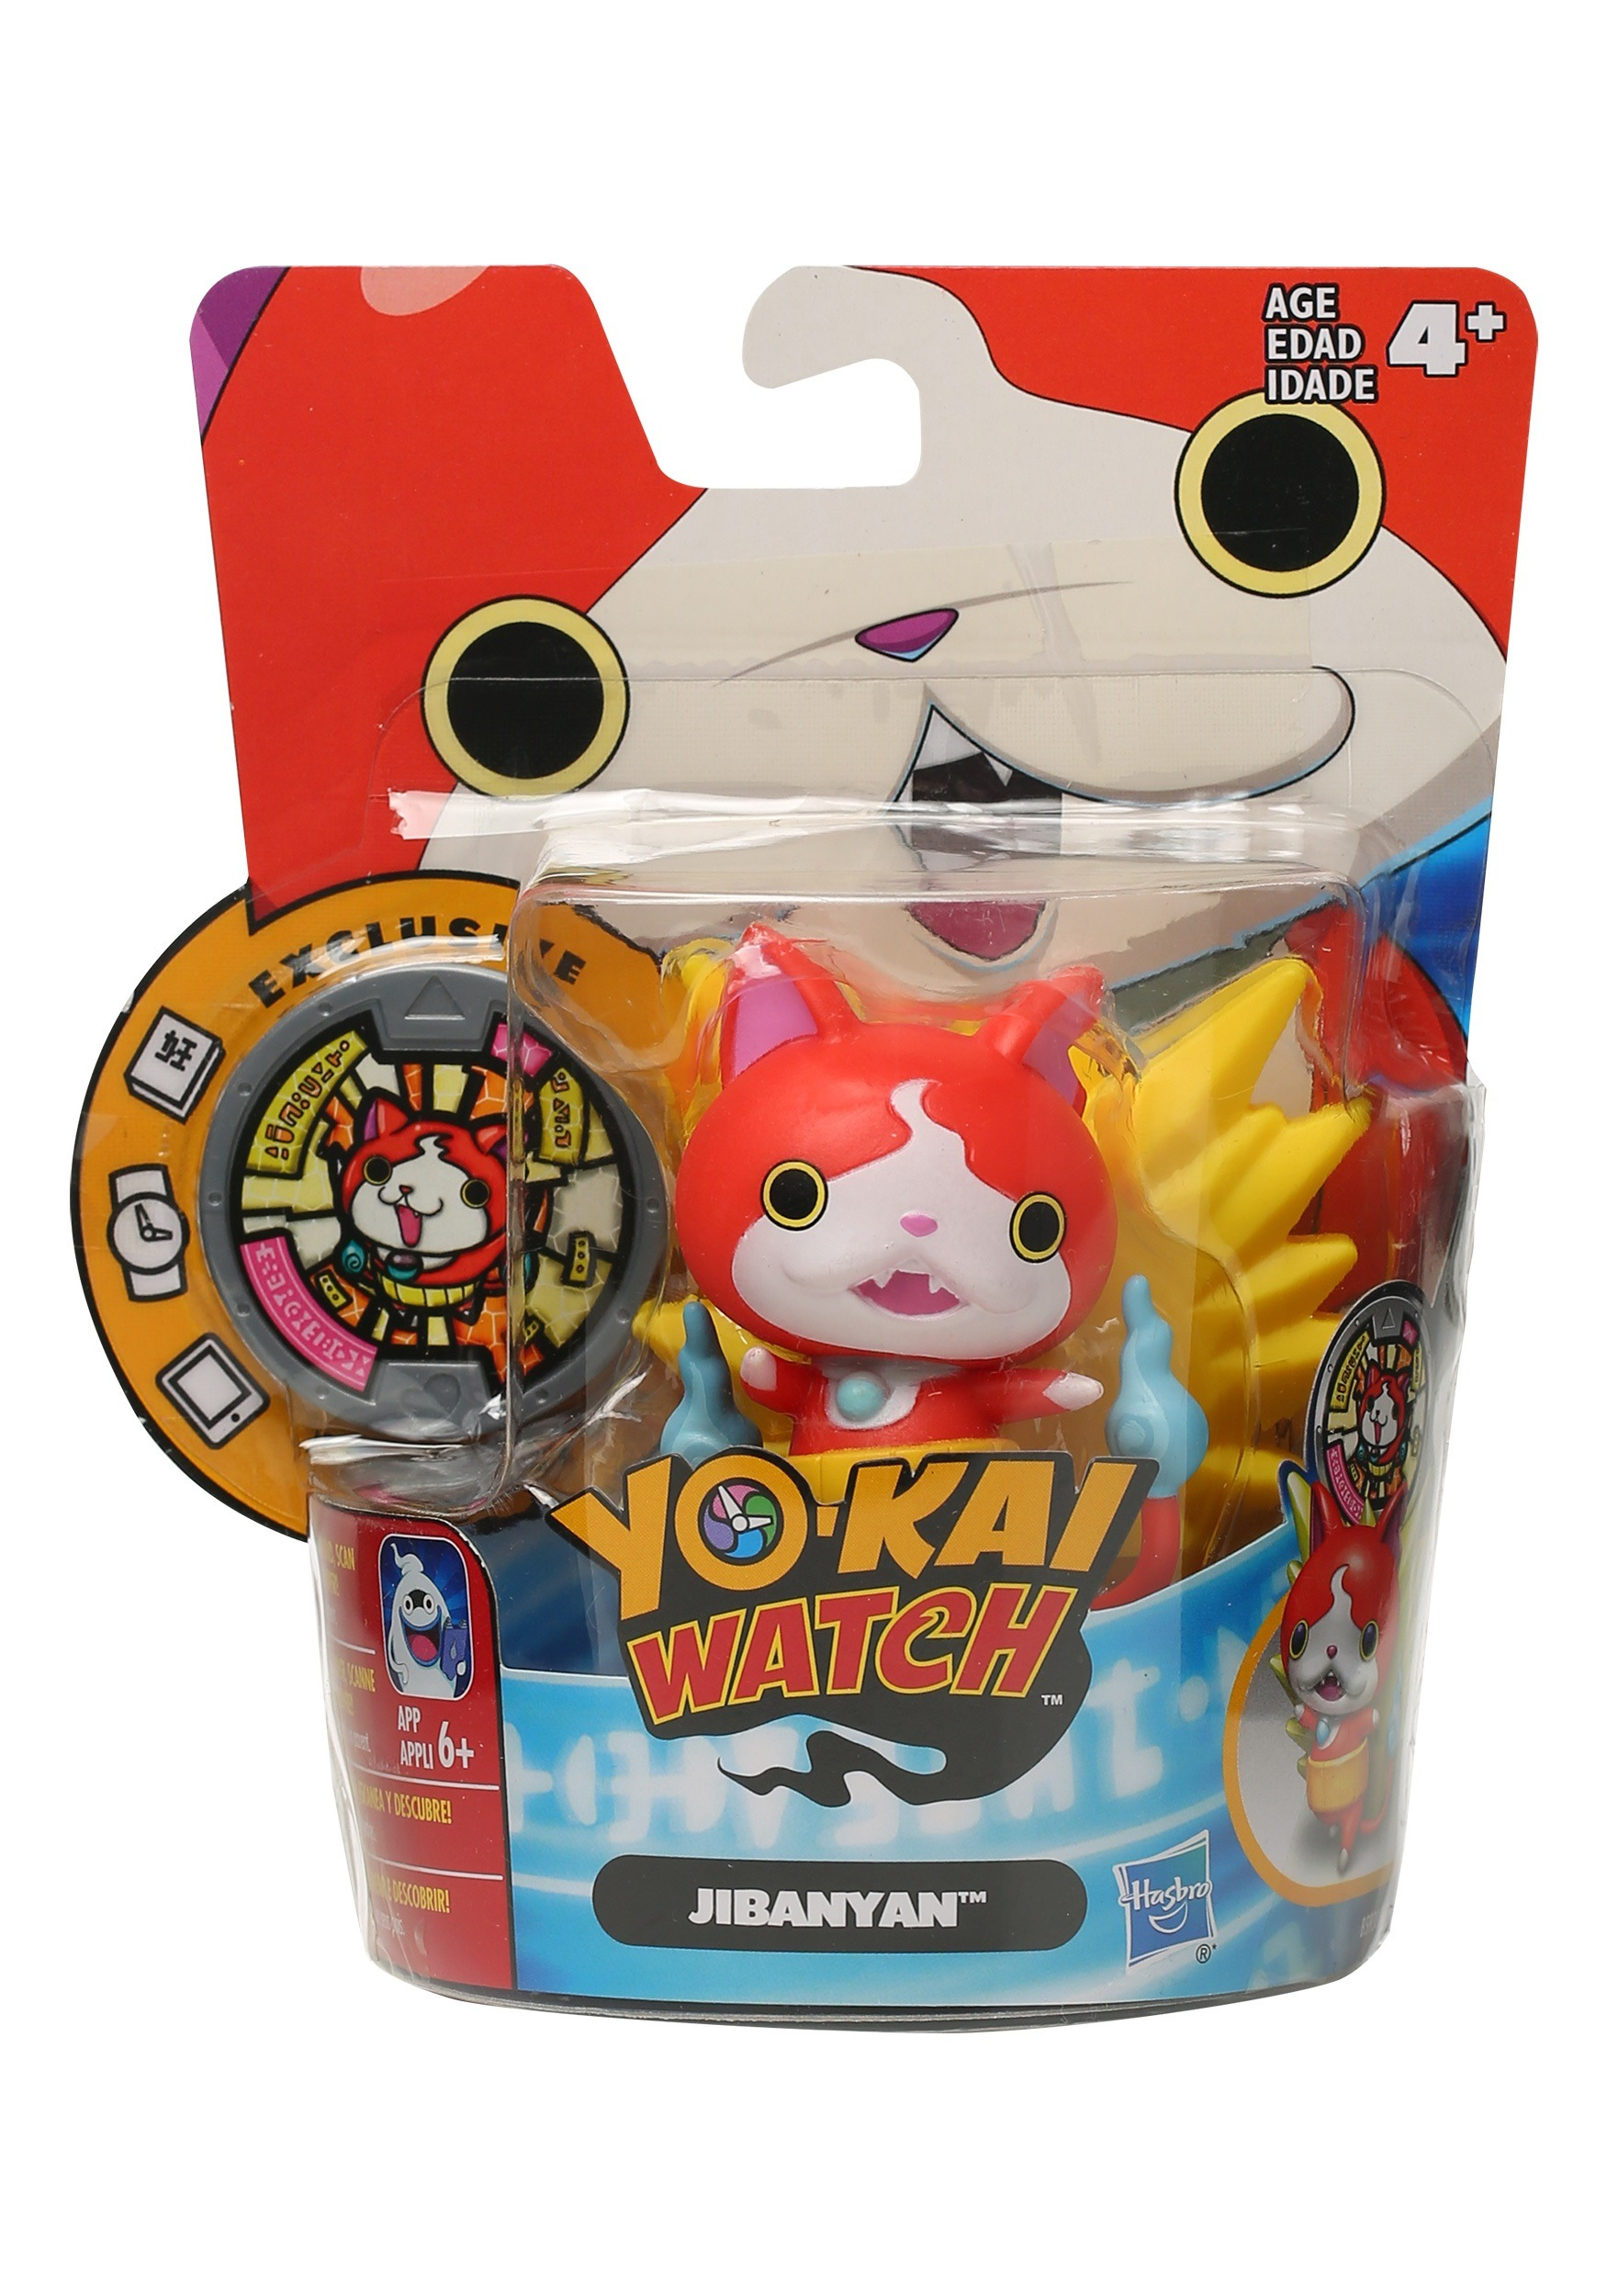 Yo-Kai Watch Medal Moments Jibanyan Vinyl Figure EEDB5938AS00